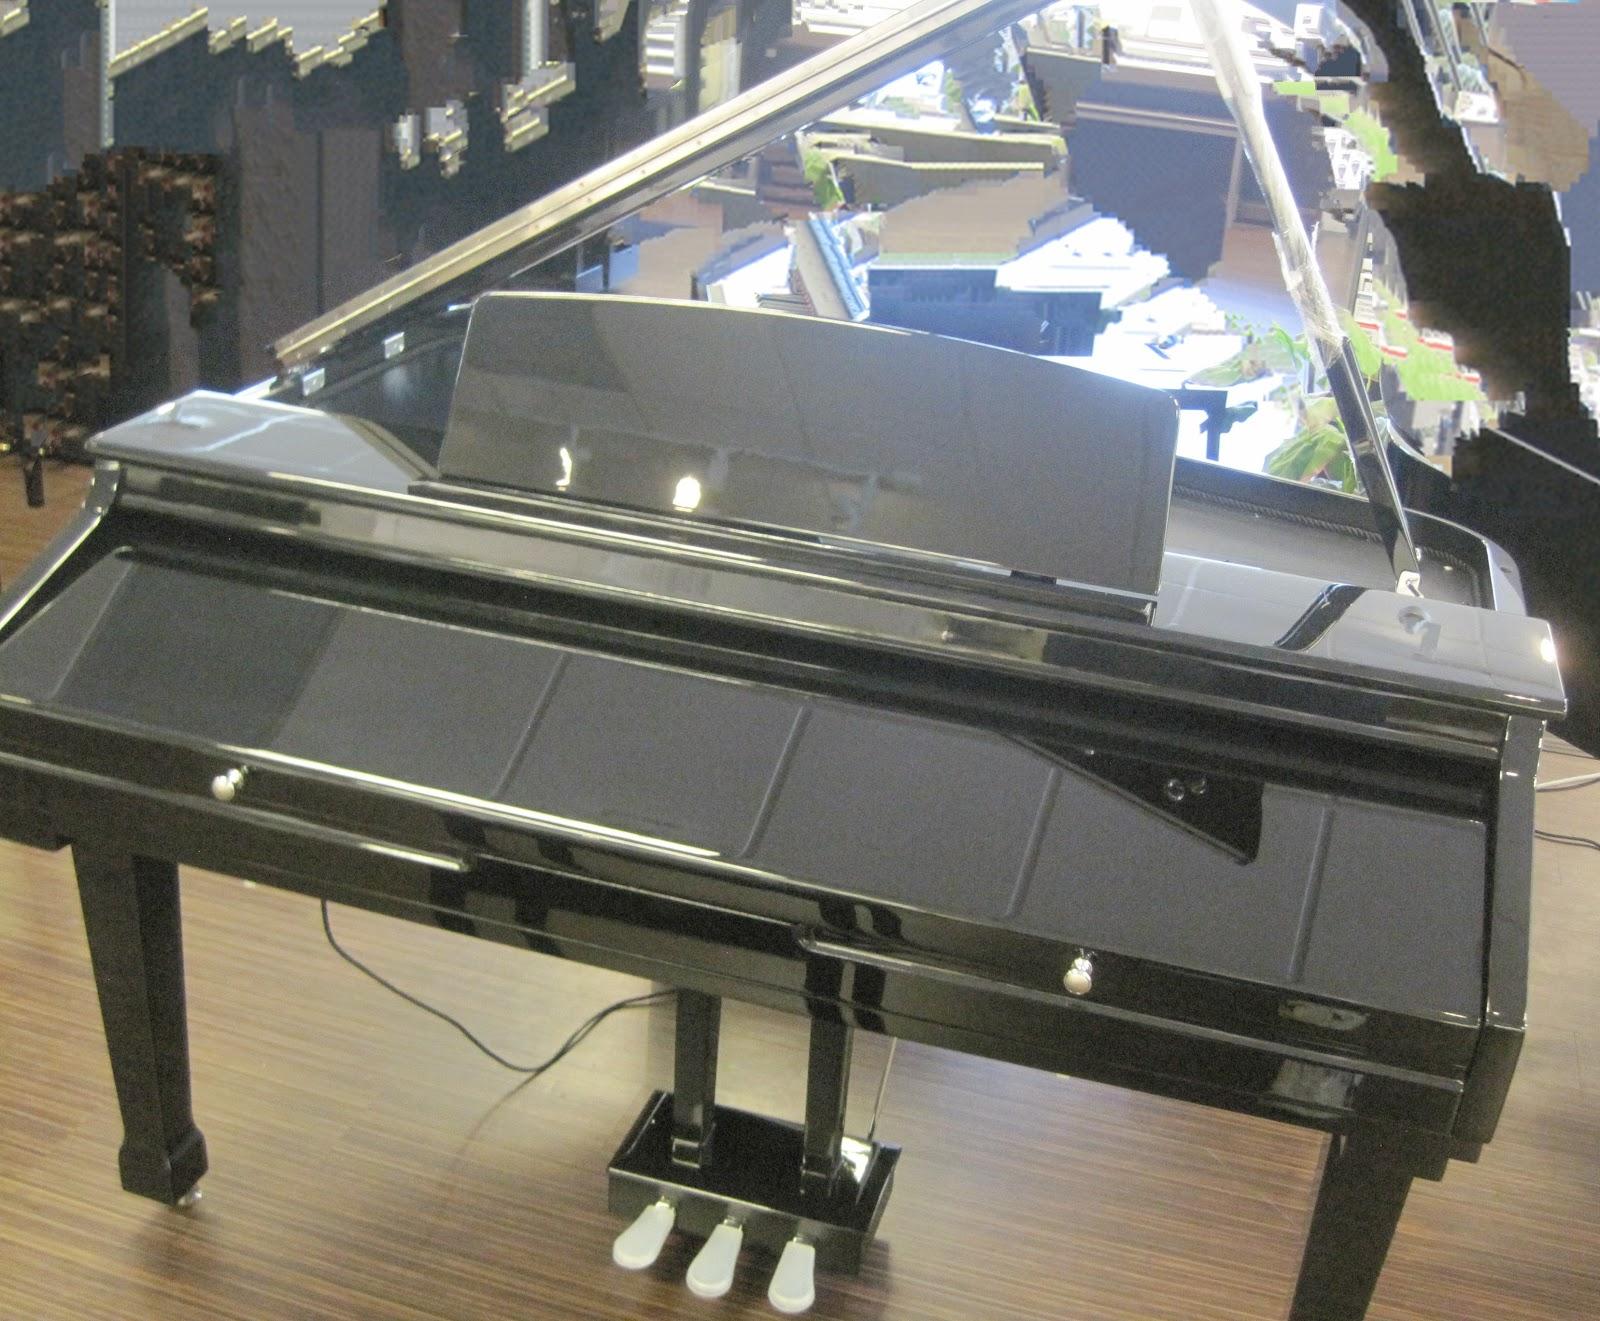 Mini Grand Piano Parts Diagram Trusted Wiring Az Reviews Review Samick Sg110 Sg310 Sg450 Digital Pianos Main Of A